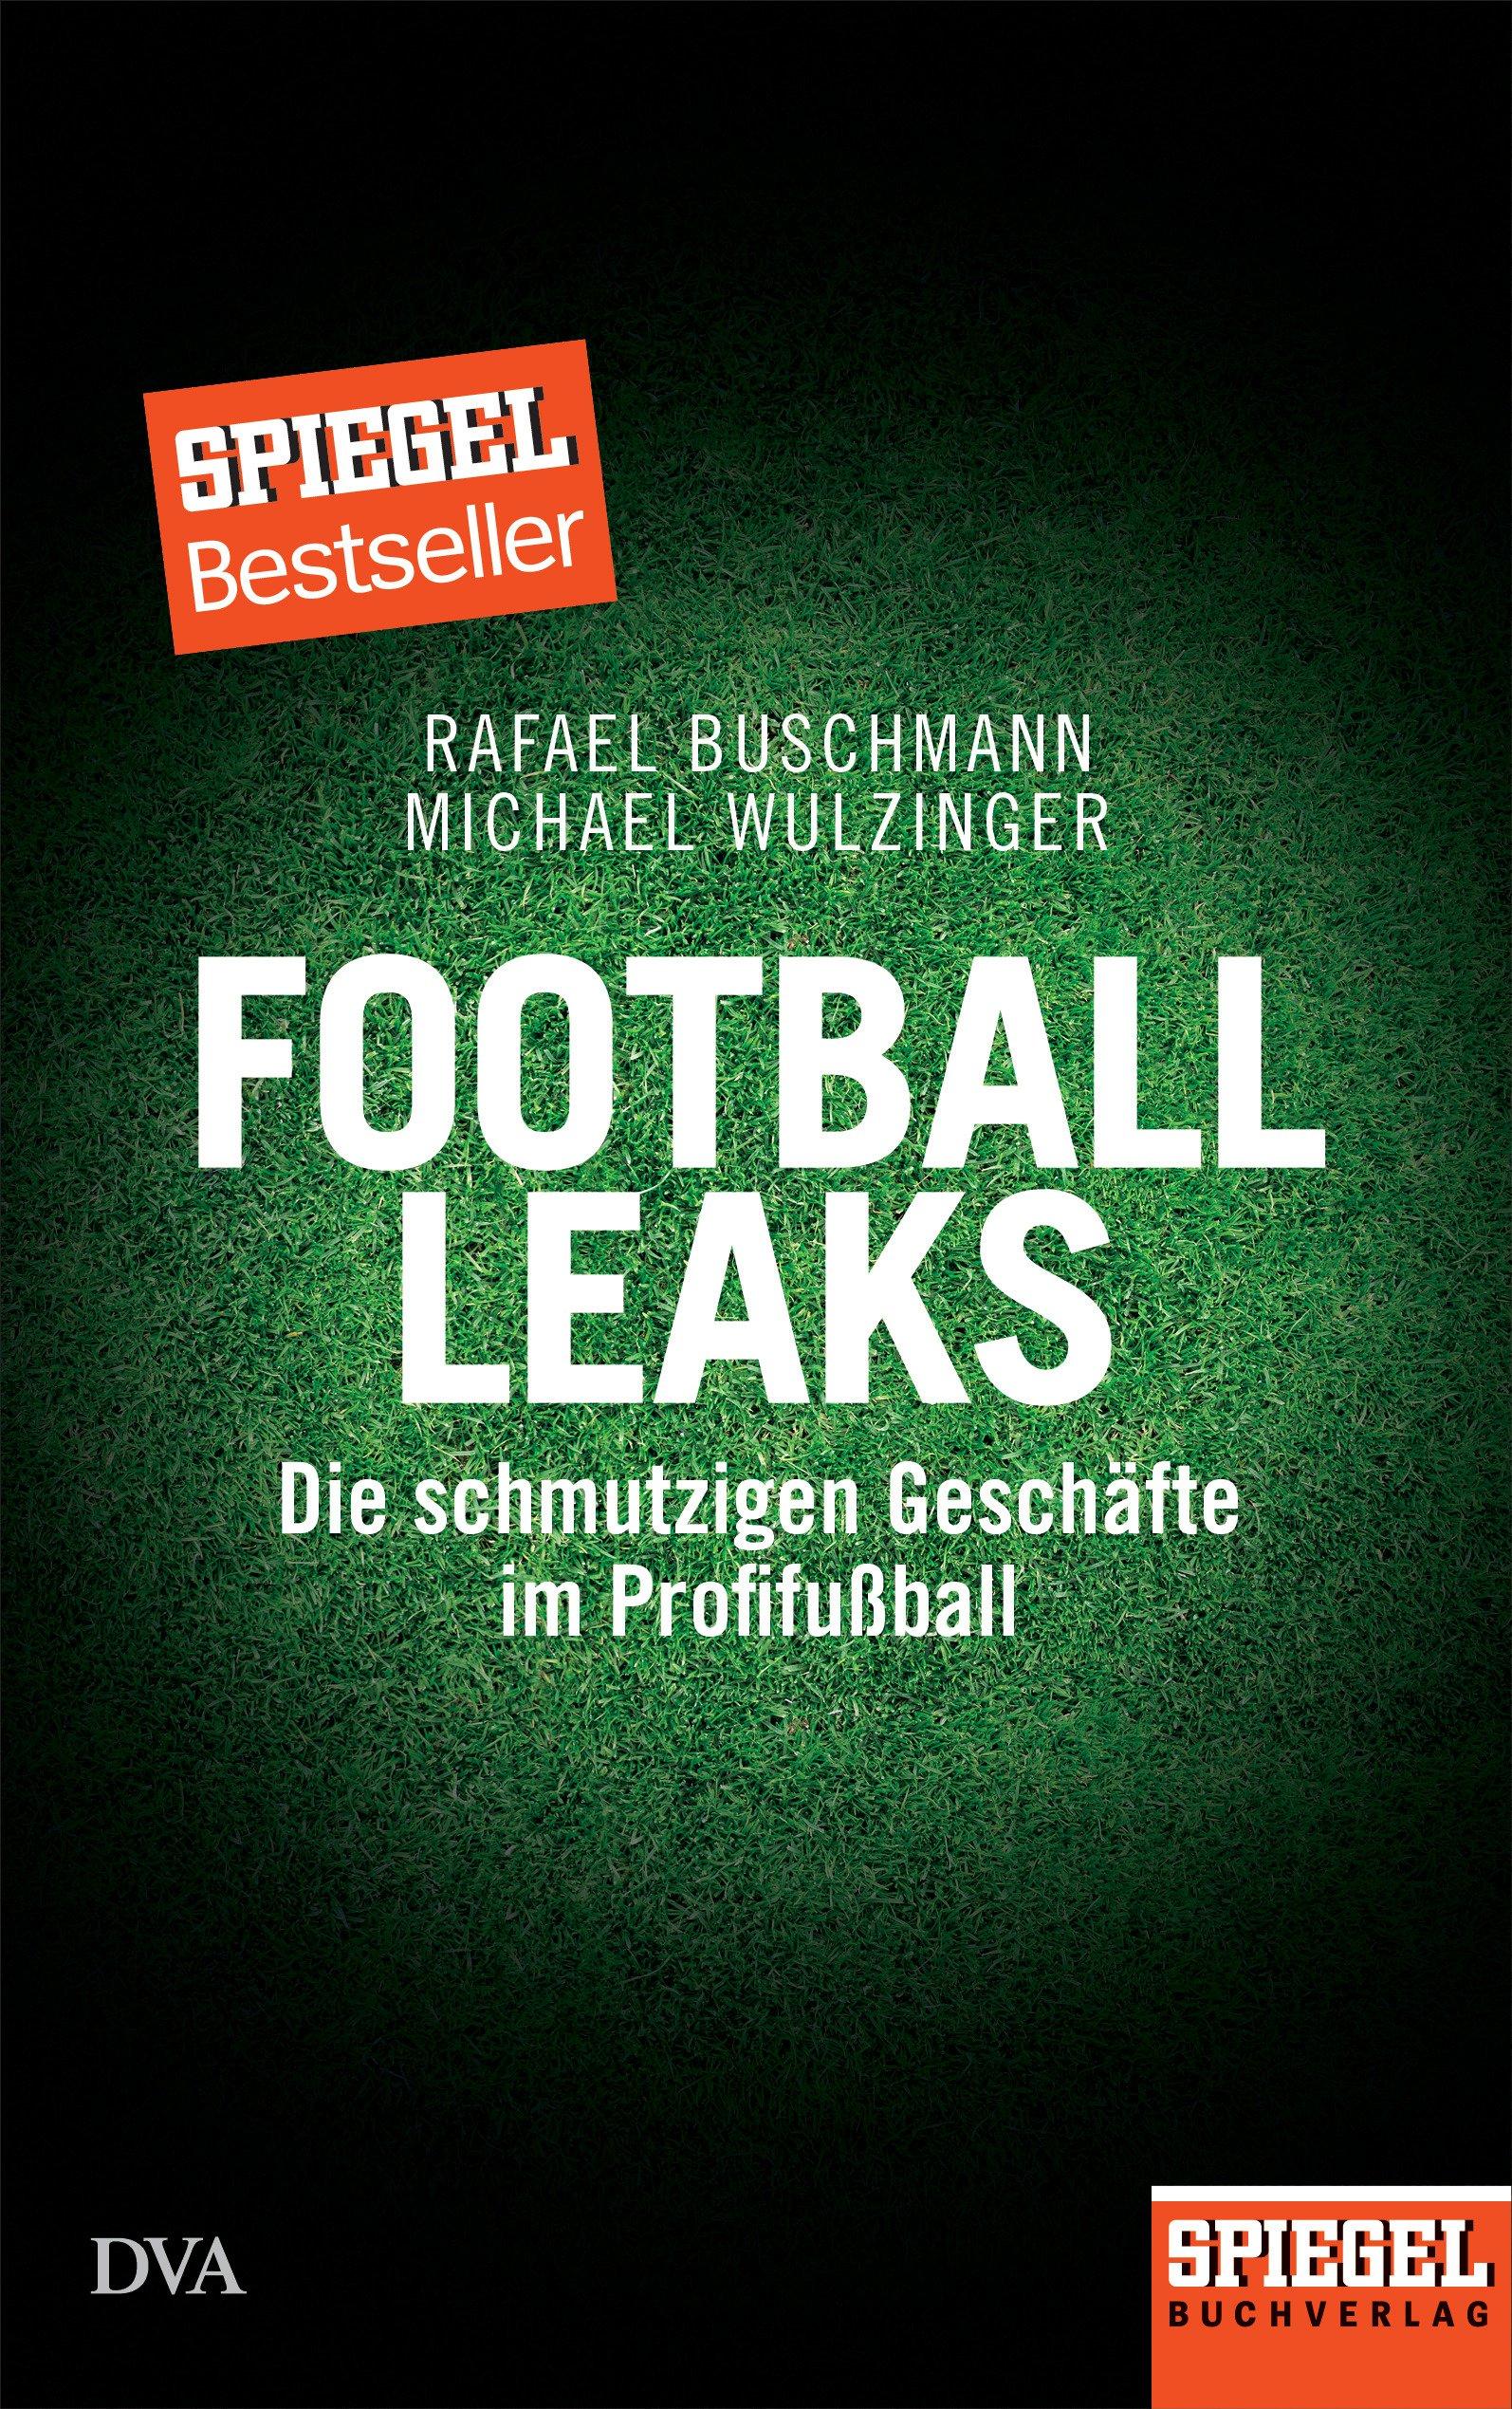 Football Leaks Schmutzigen Geschafte Im Profifusball Ein Spiegel Buch Amazon Es Rafael Buschmann Michael Wulzinger Libros En Idiomas Extranjeros